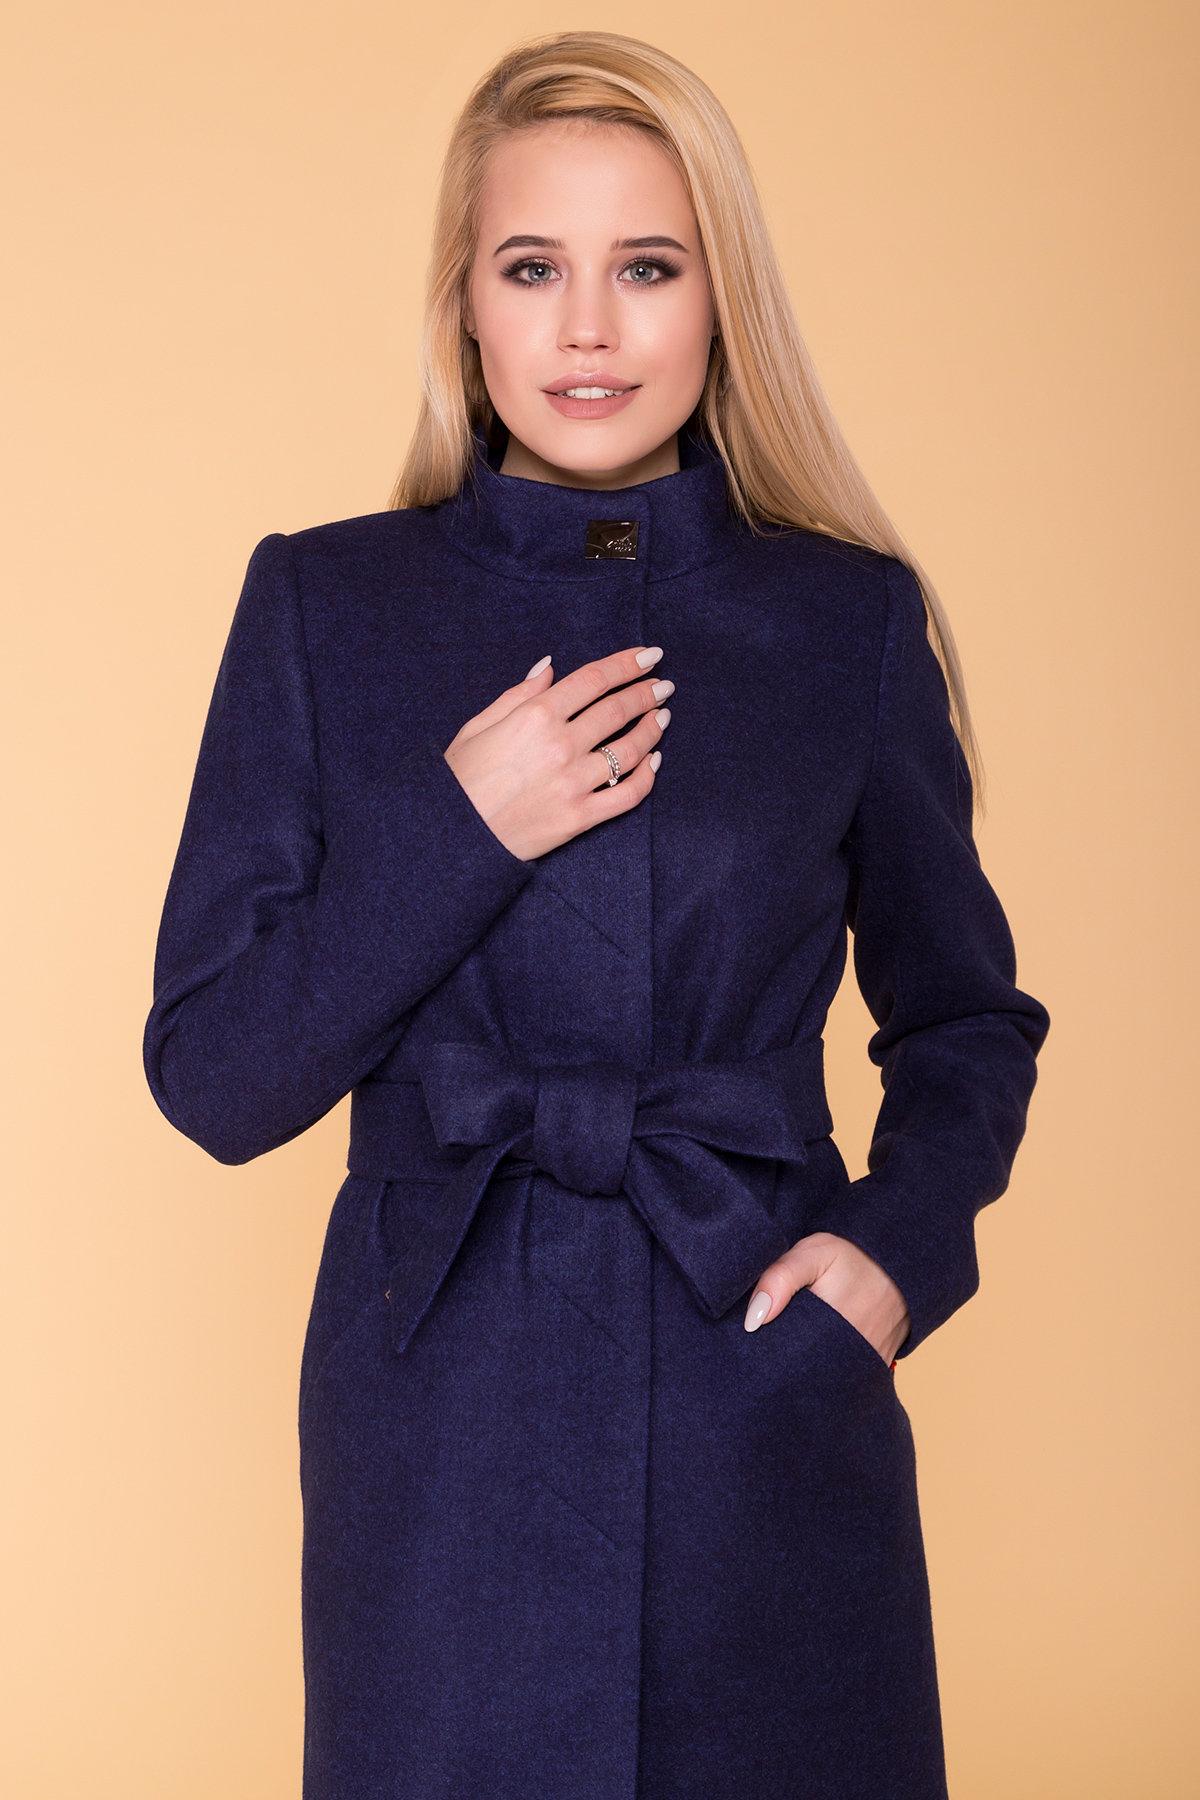 Пальто Сплит 4374 АРТ. 37660 Цвет: Темно-синий 17 - фото 5, интернет магазин tm-modus.ru